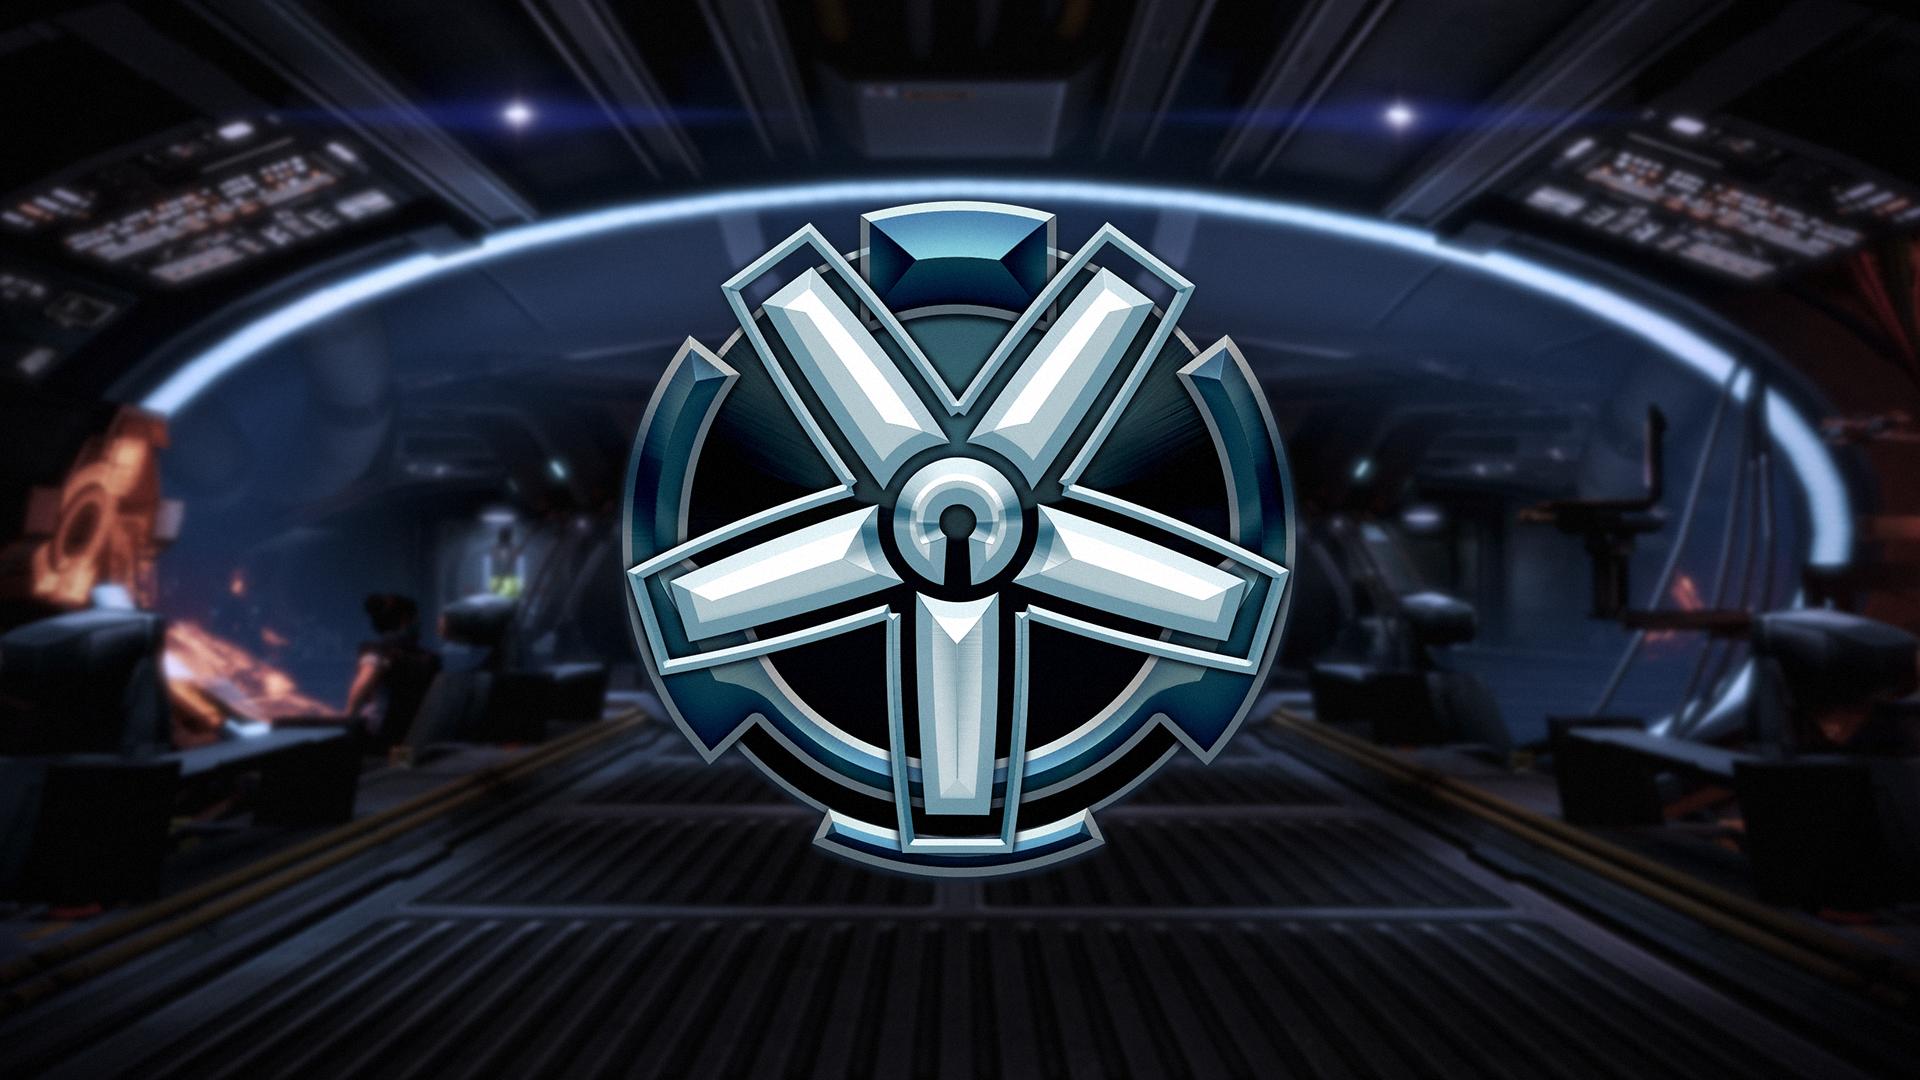 Icon for Council Legion of Merit